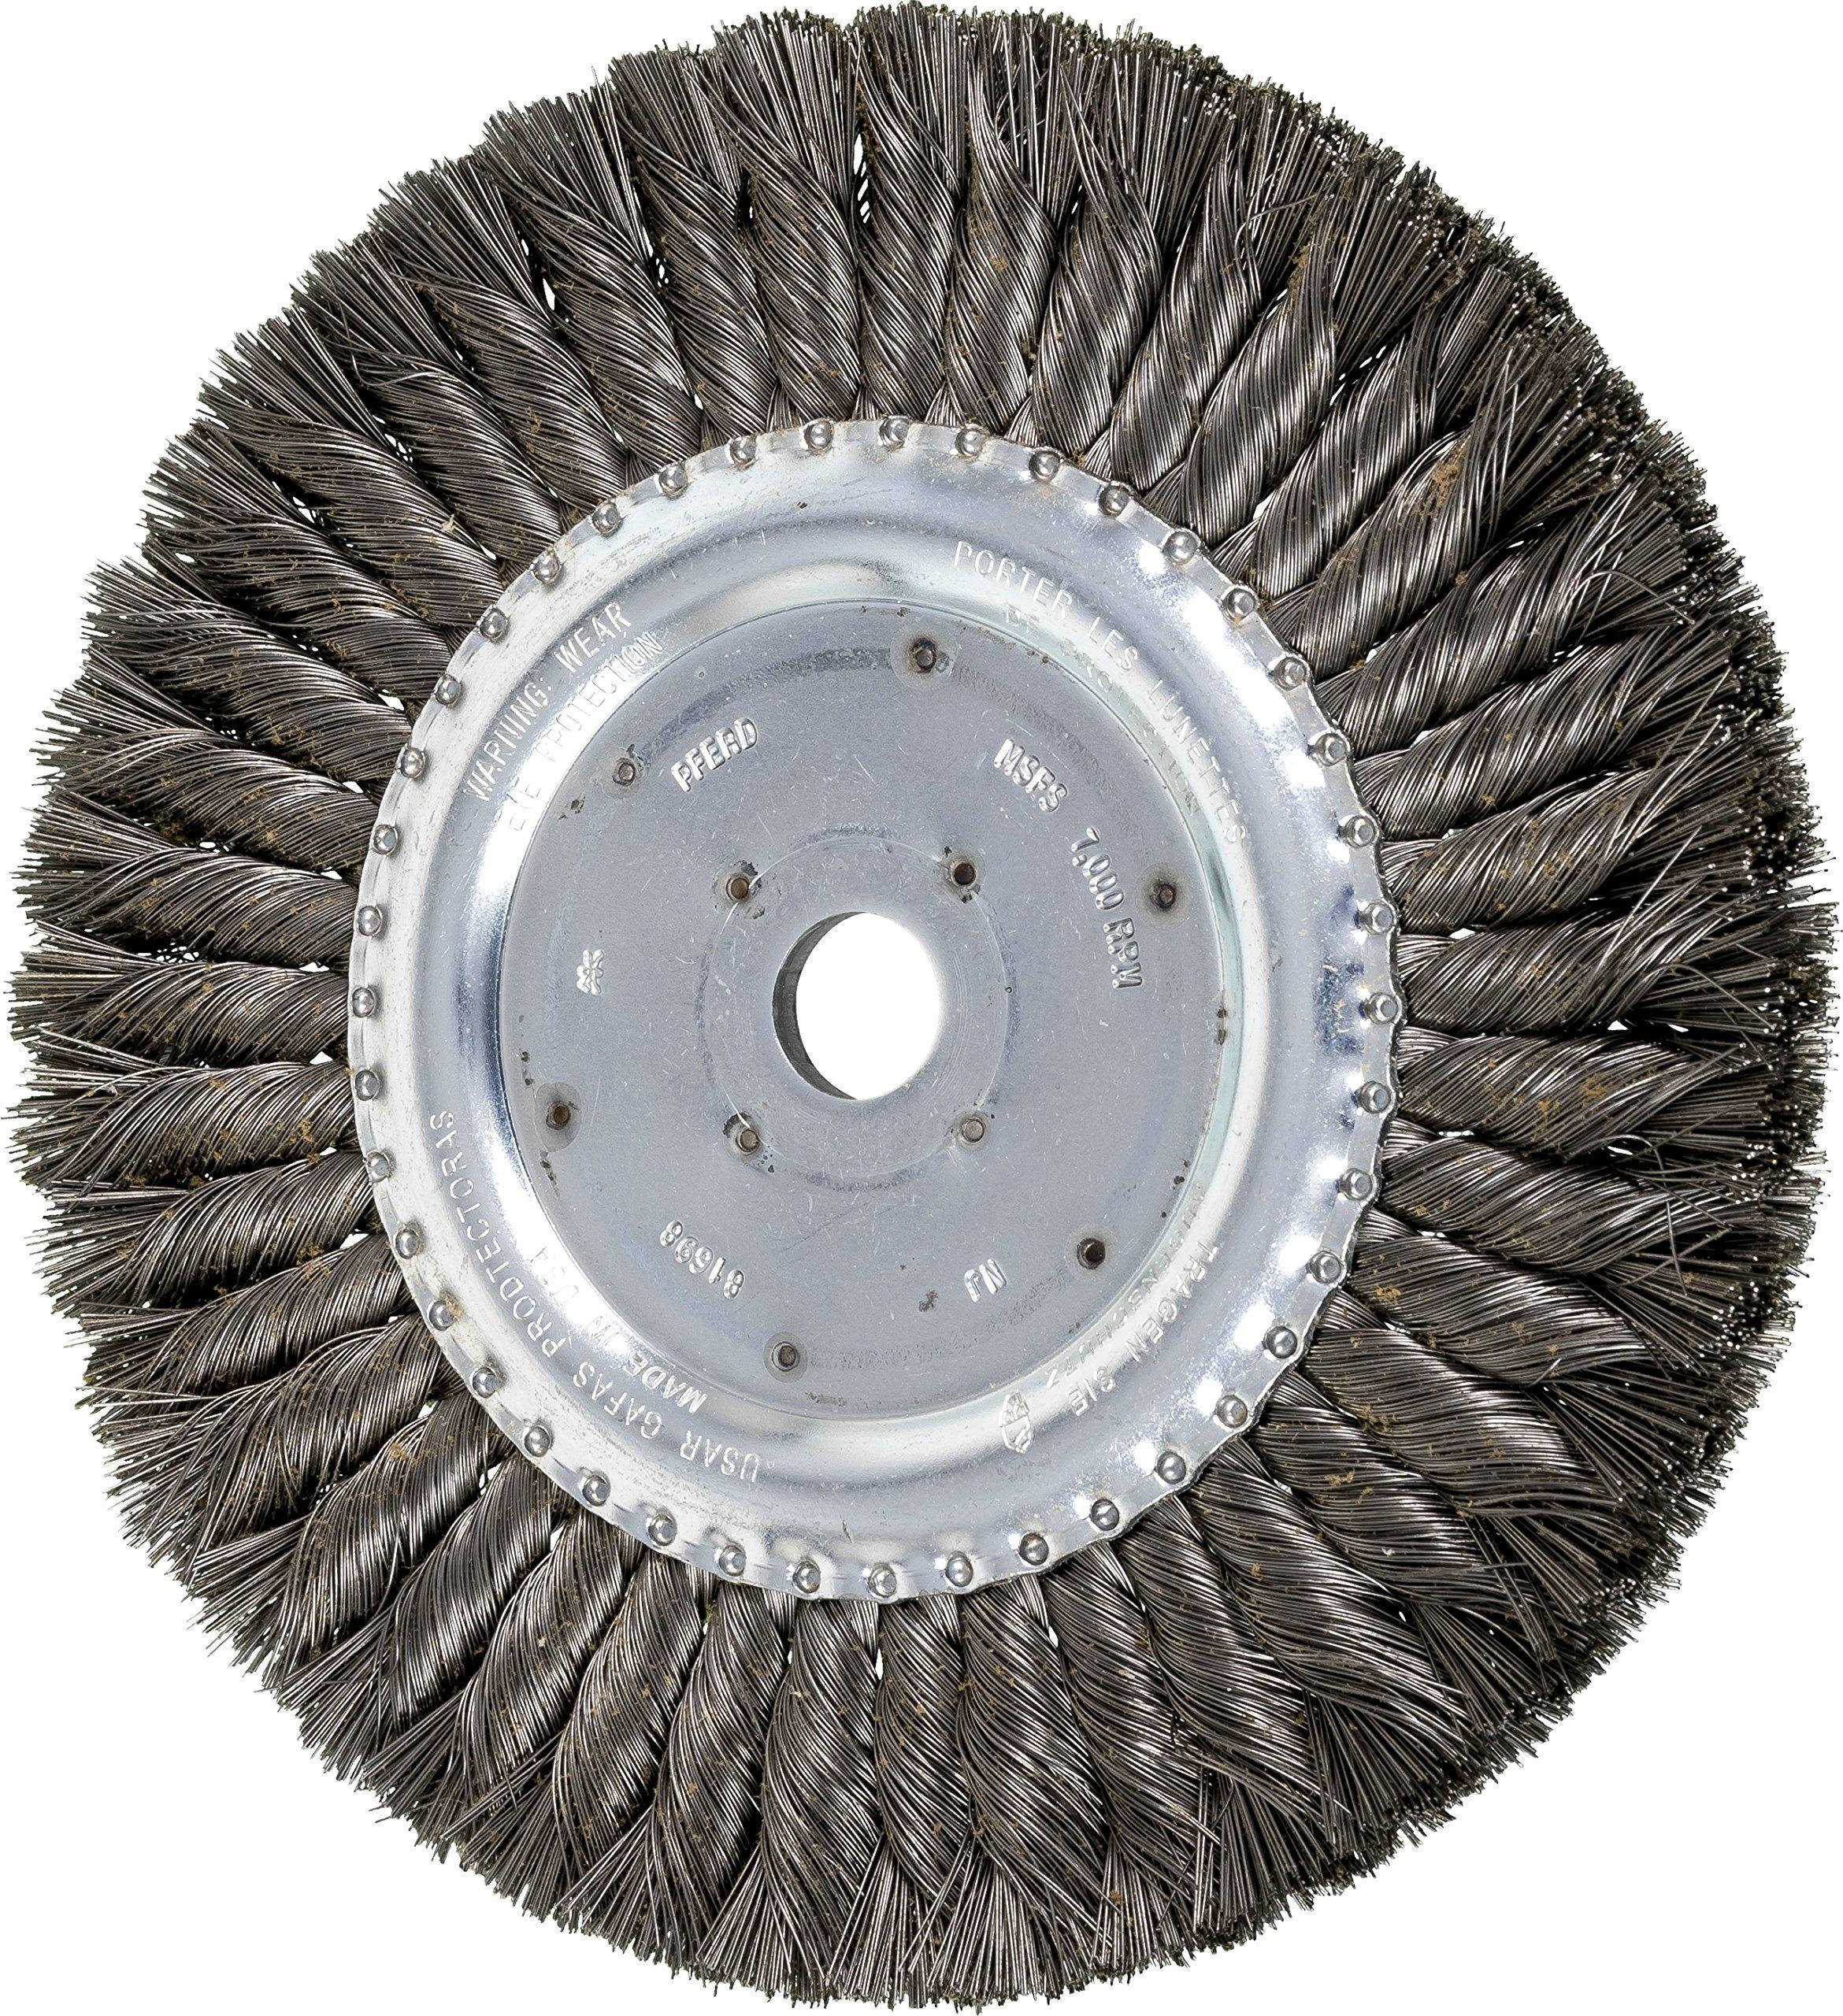 PFERD 81698 Standard Twist Knot Wheel Brush, Carbon Steel Wire, 8'' Diameter, 3/4'' Arbor Hole, 0.014 Wire Size, 1-5/8'' Trim Length, 5/8'' Face Width, 7000 RPM